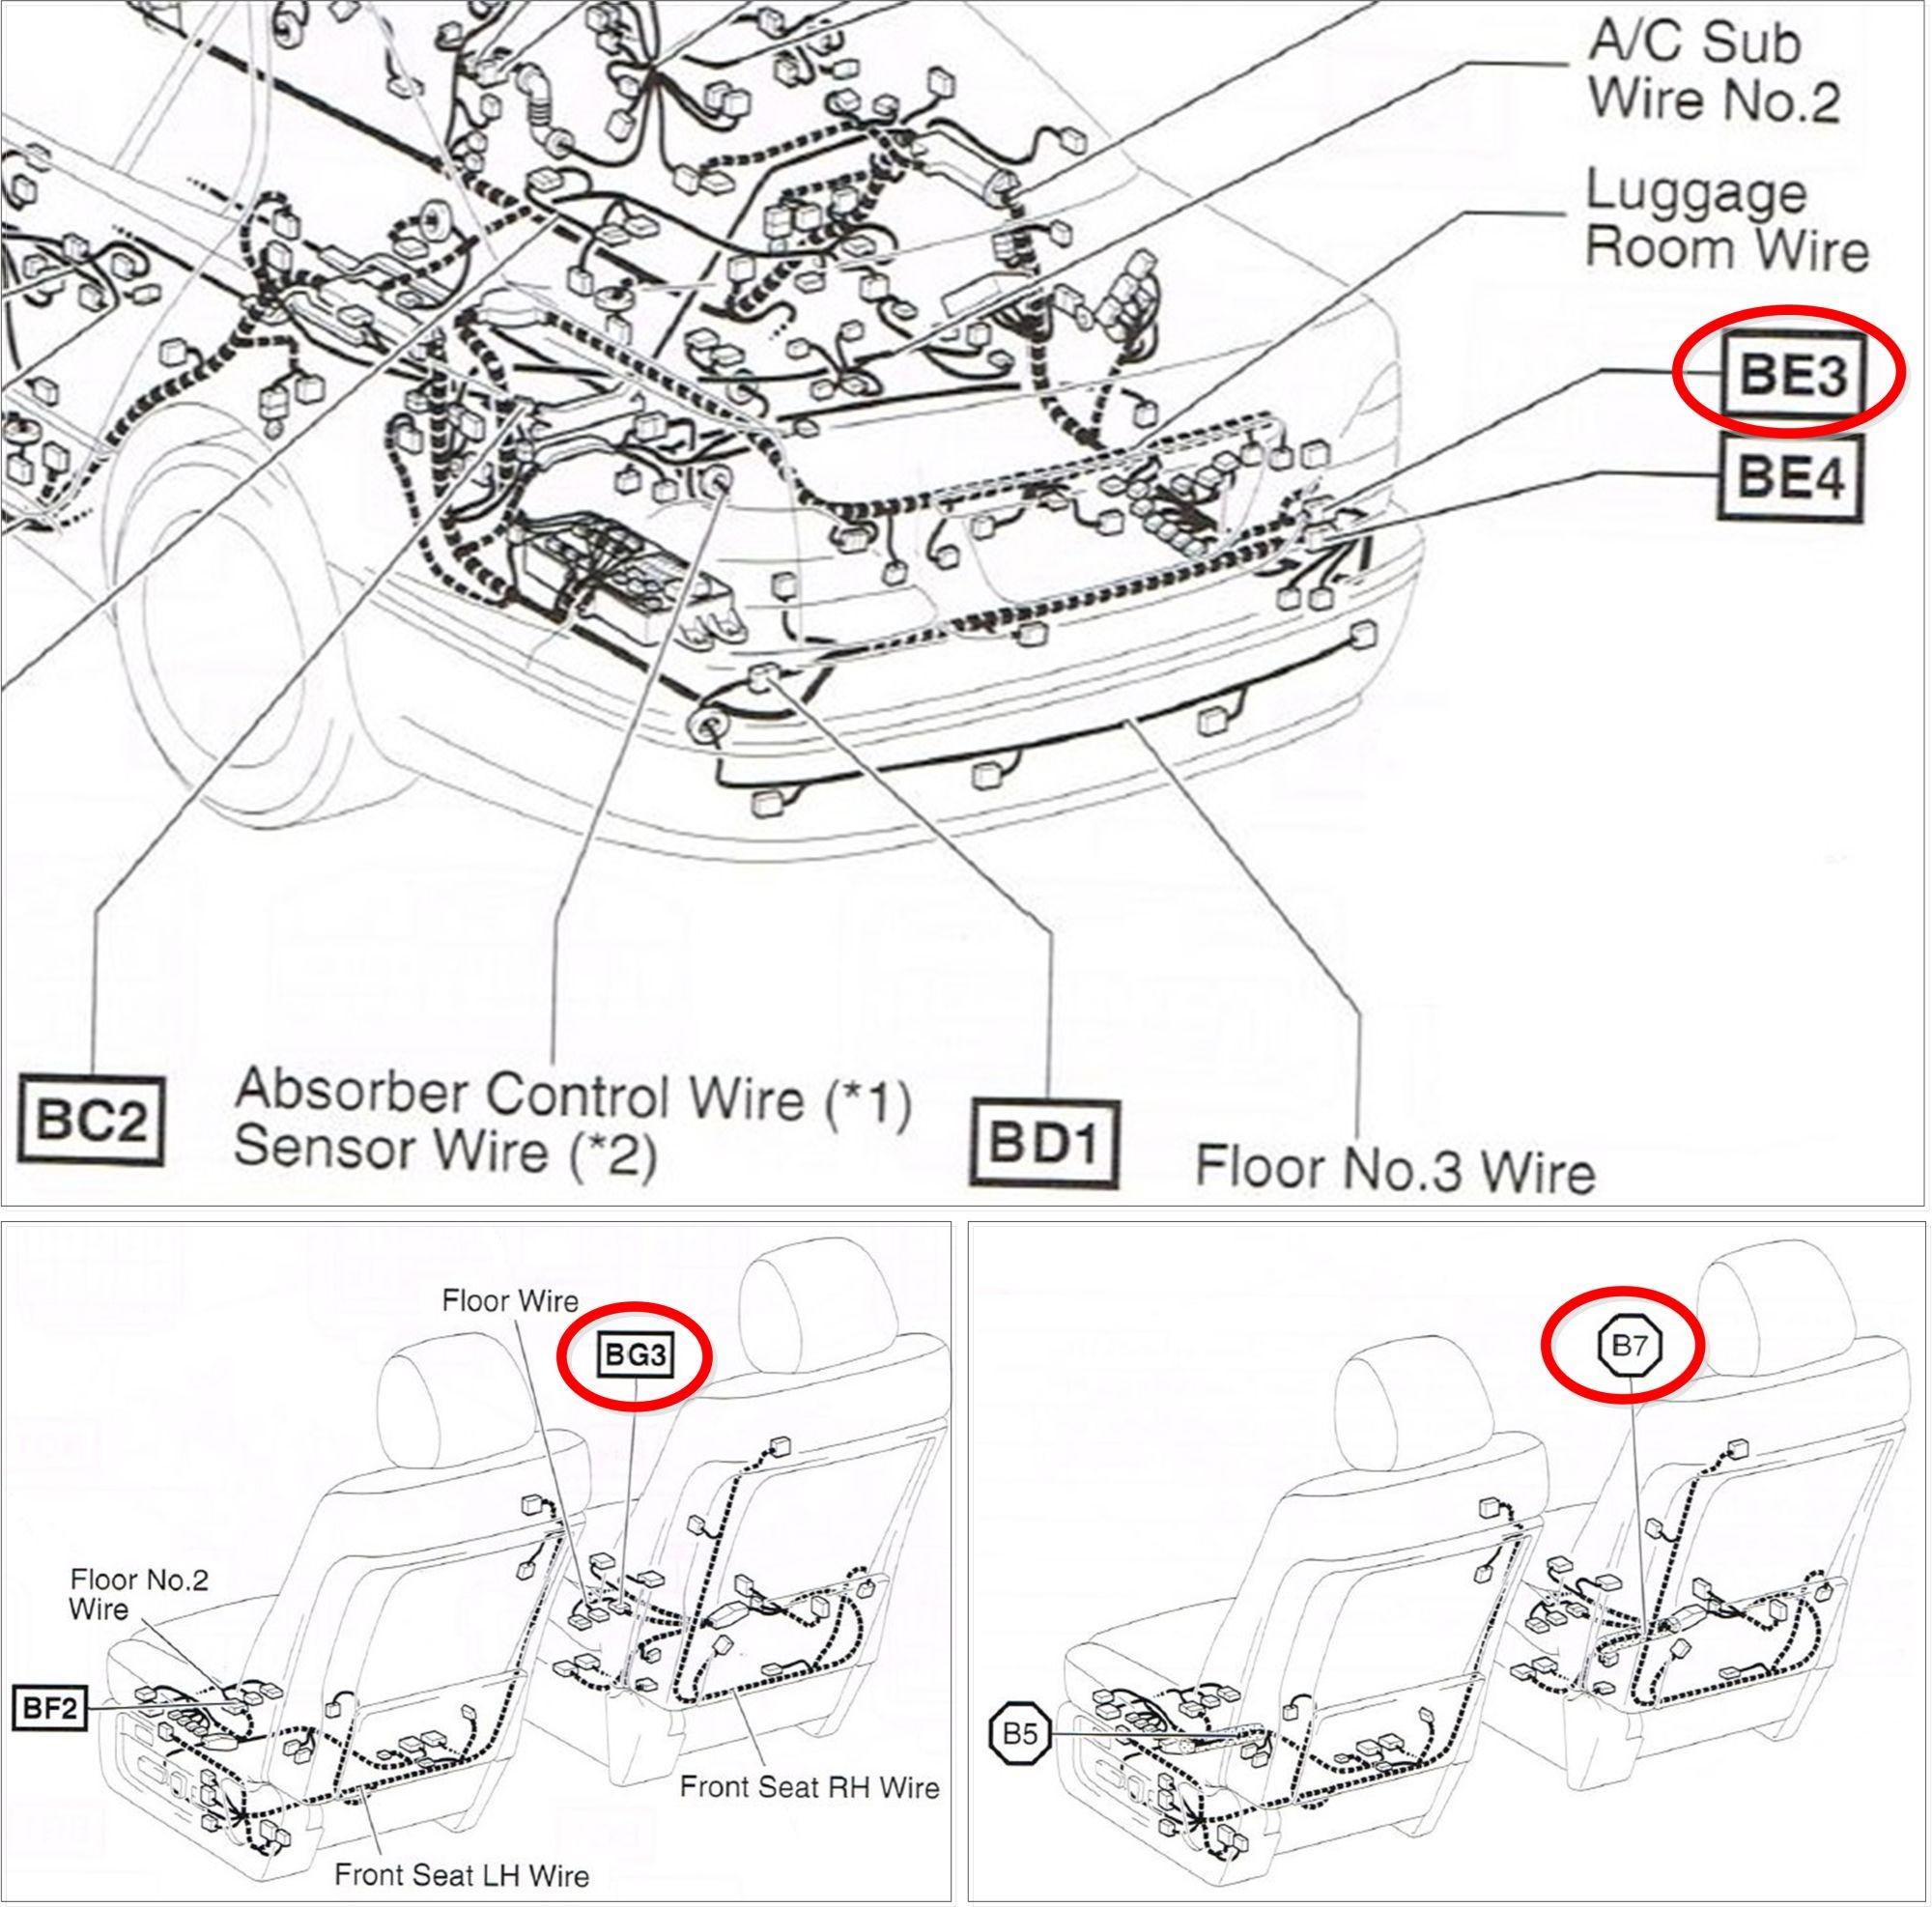 1998 Lexus Es300 Engine Diagram 2002 Lexus Es300 Engine Diagram Wiring Diagram Data today Of 1998 Lexus Es300 Engine Diagram